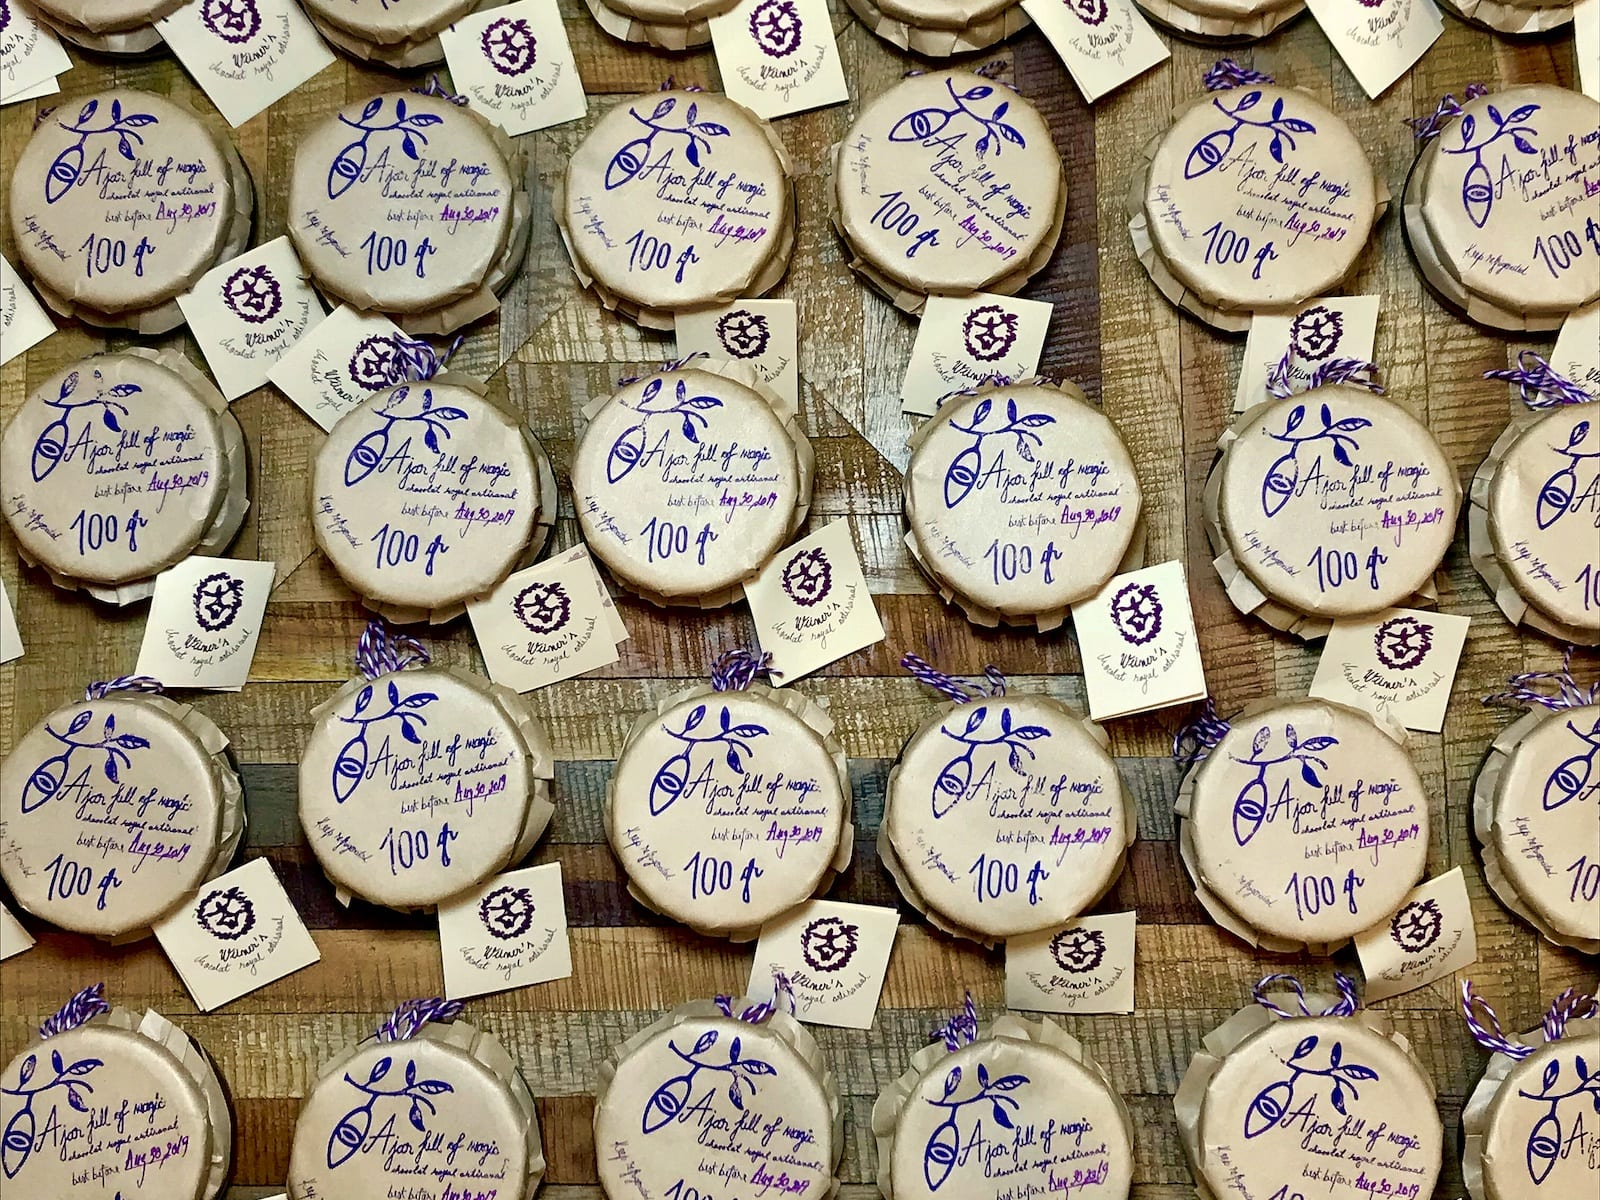 Weiner's Chocolate Artisanal